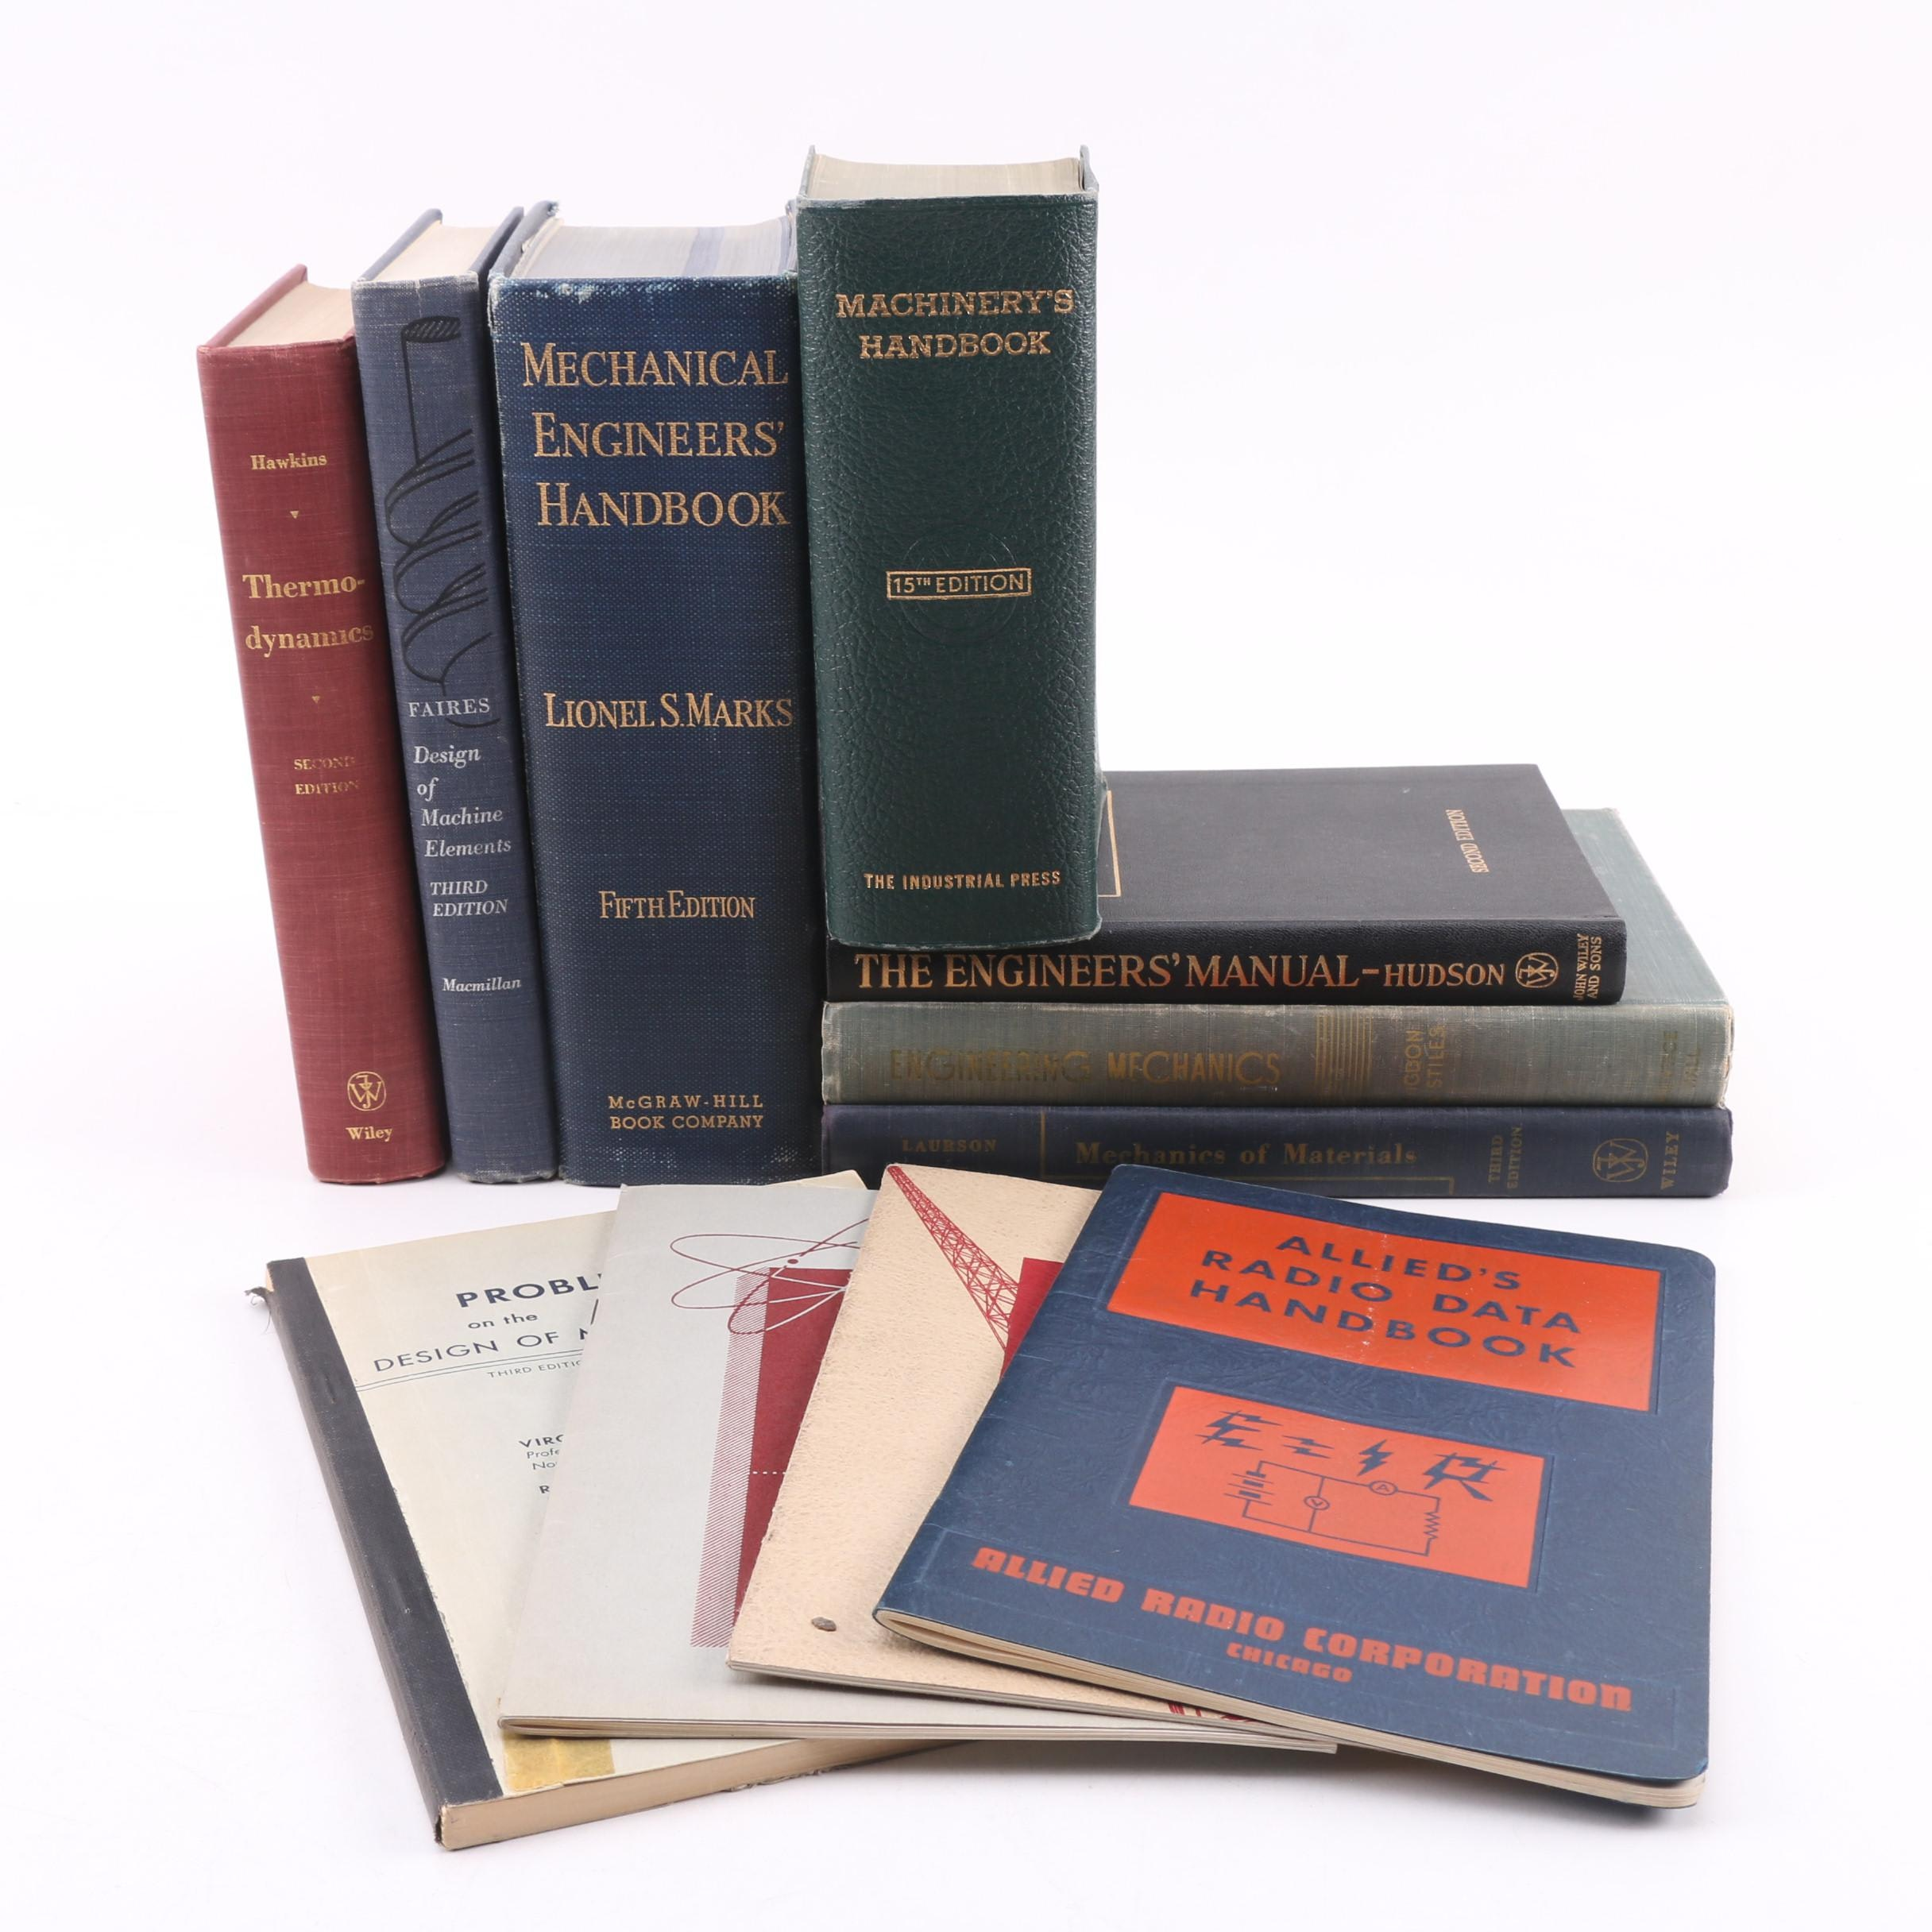 Vintage 1950s Engineering, Radio, and Mechanics Reference Books